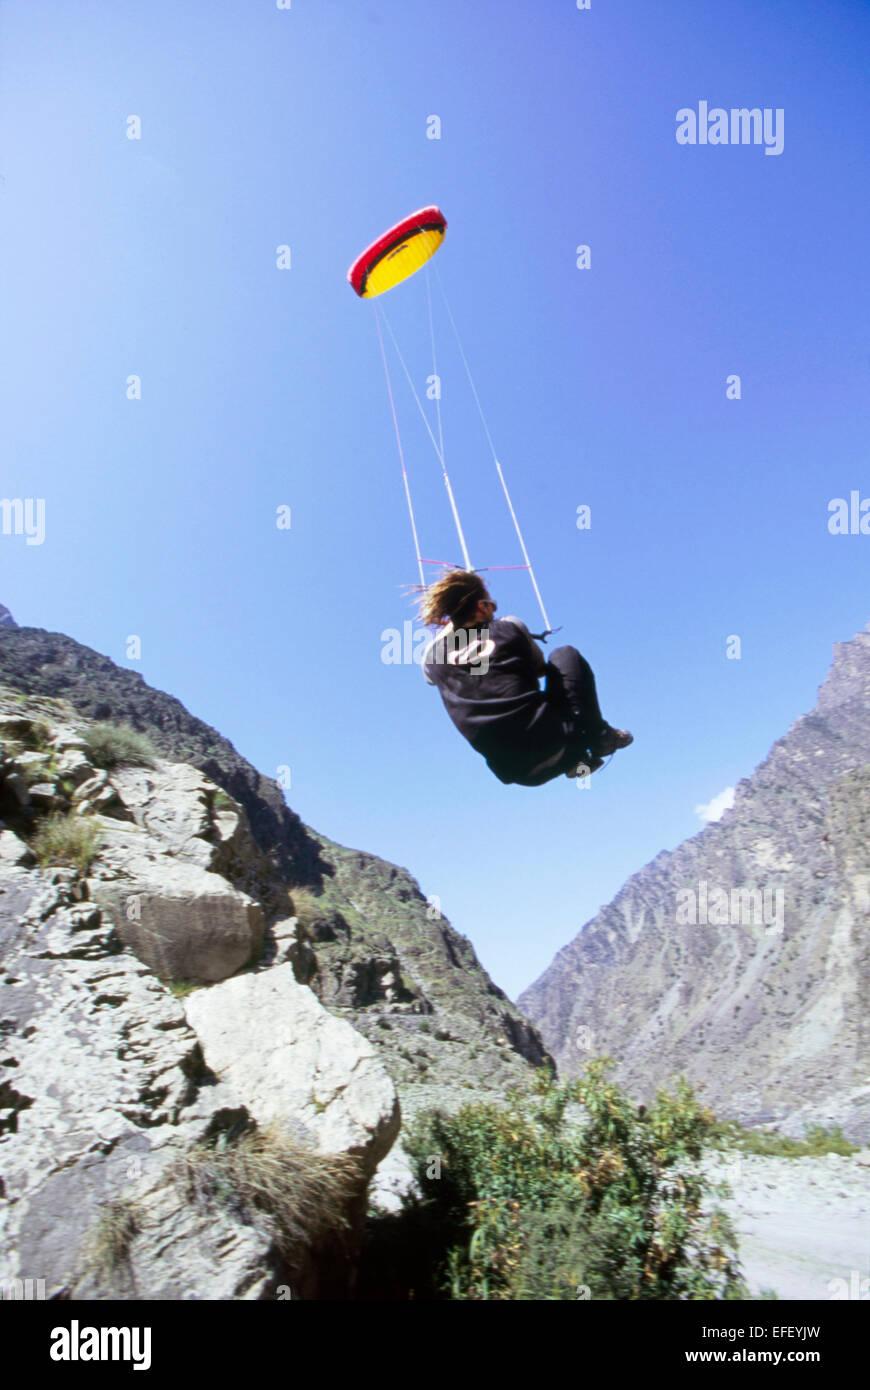 Power kite flier taking air in Karakoram range Pakistan - Stock Image